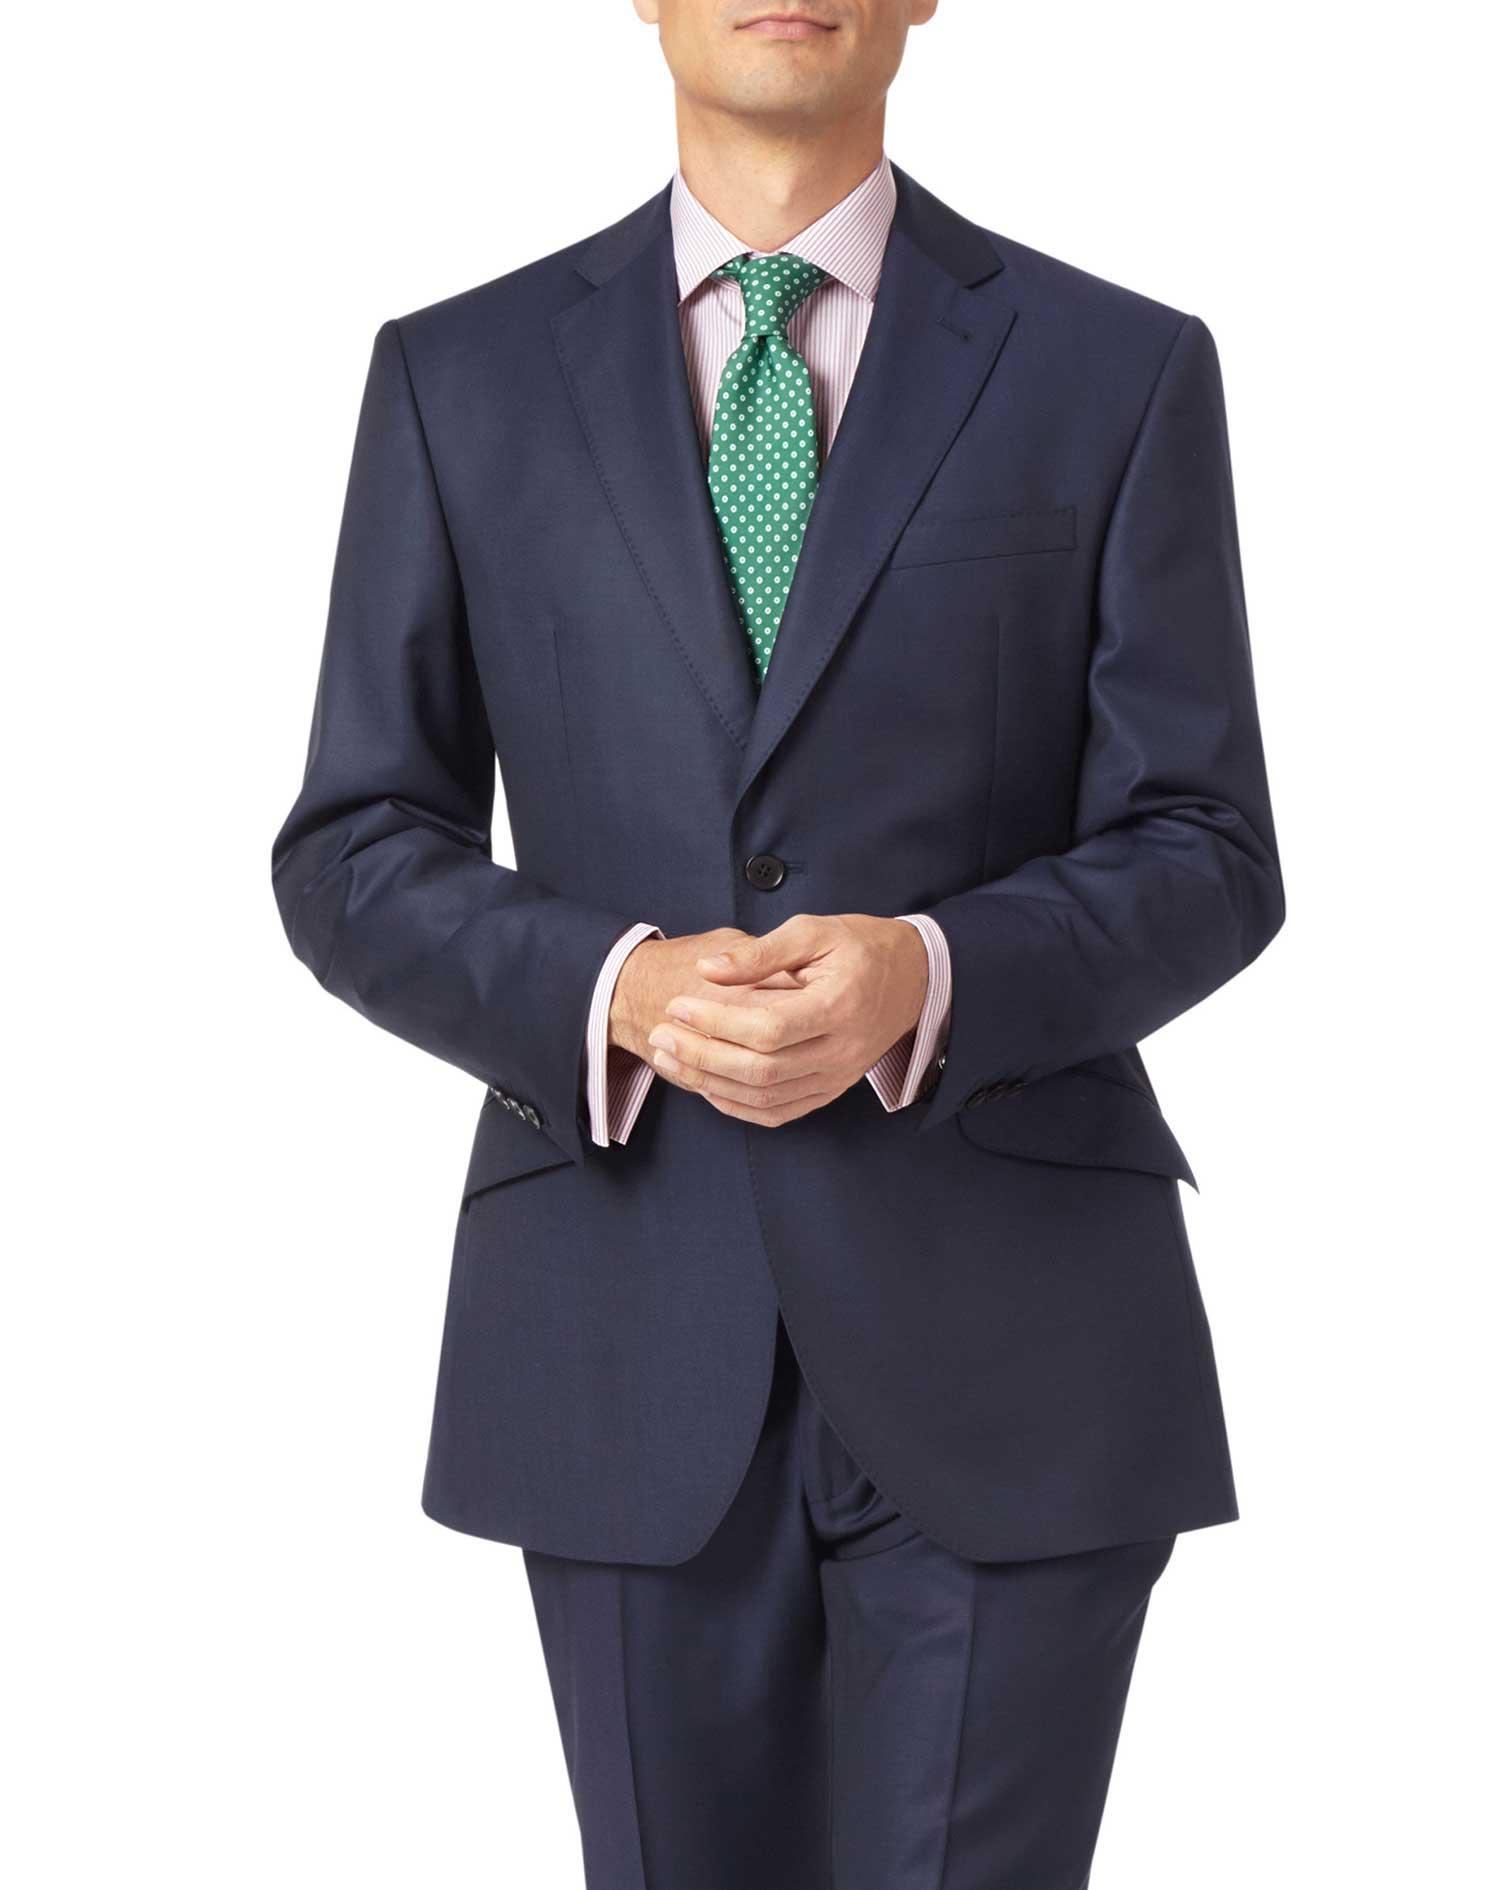 Navy Slim Fit Luxury Italian Suit Wool Jacket Size 38 Regular by Charles Tyrwhitt